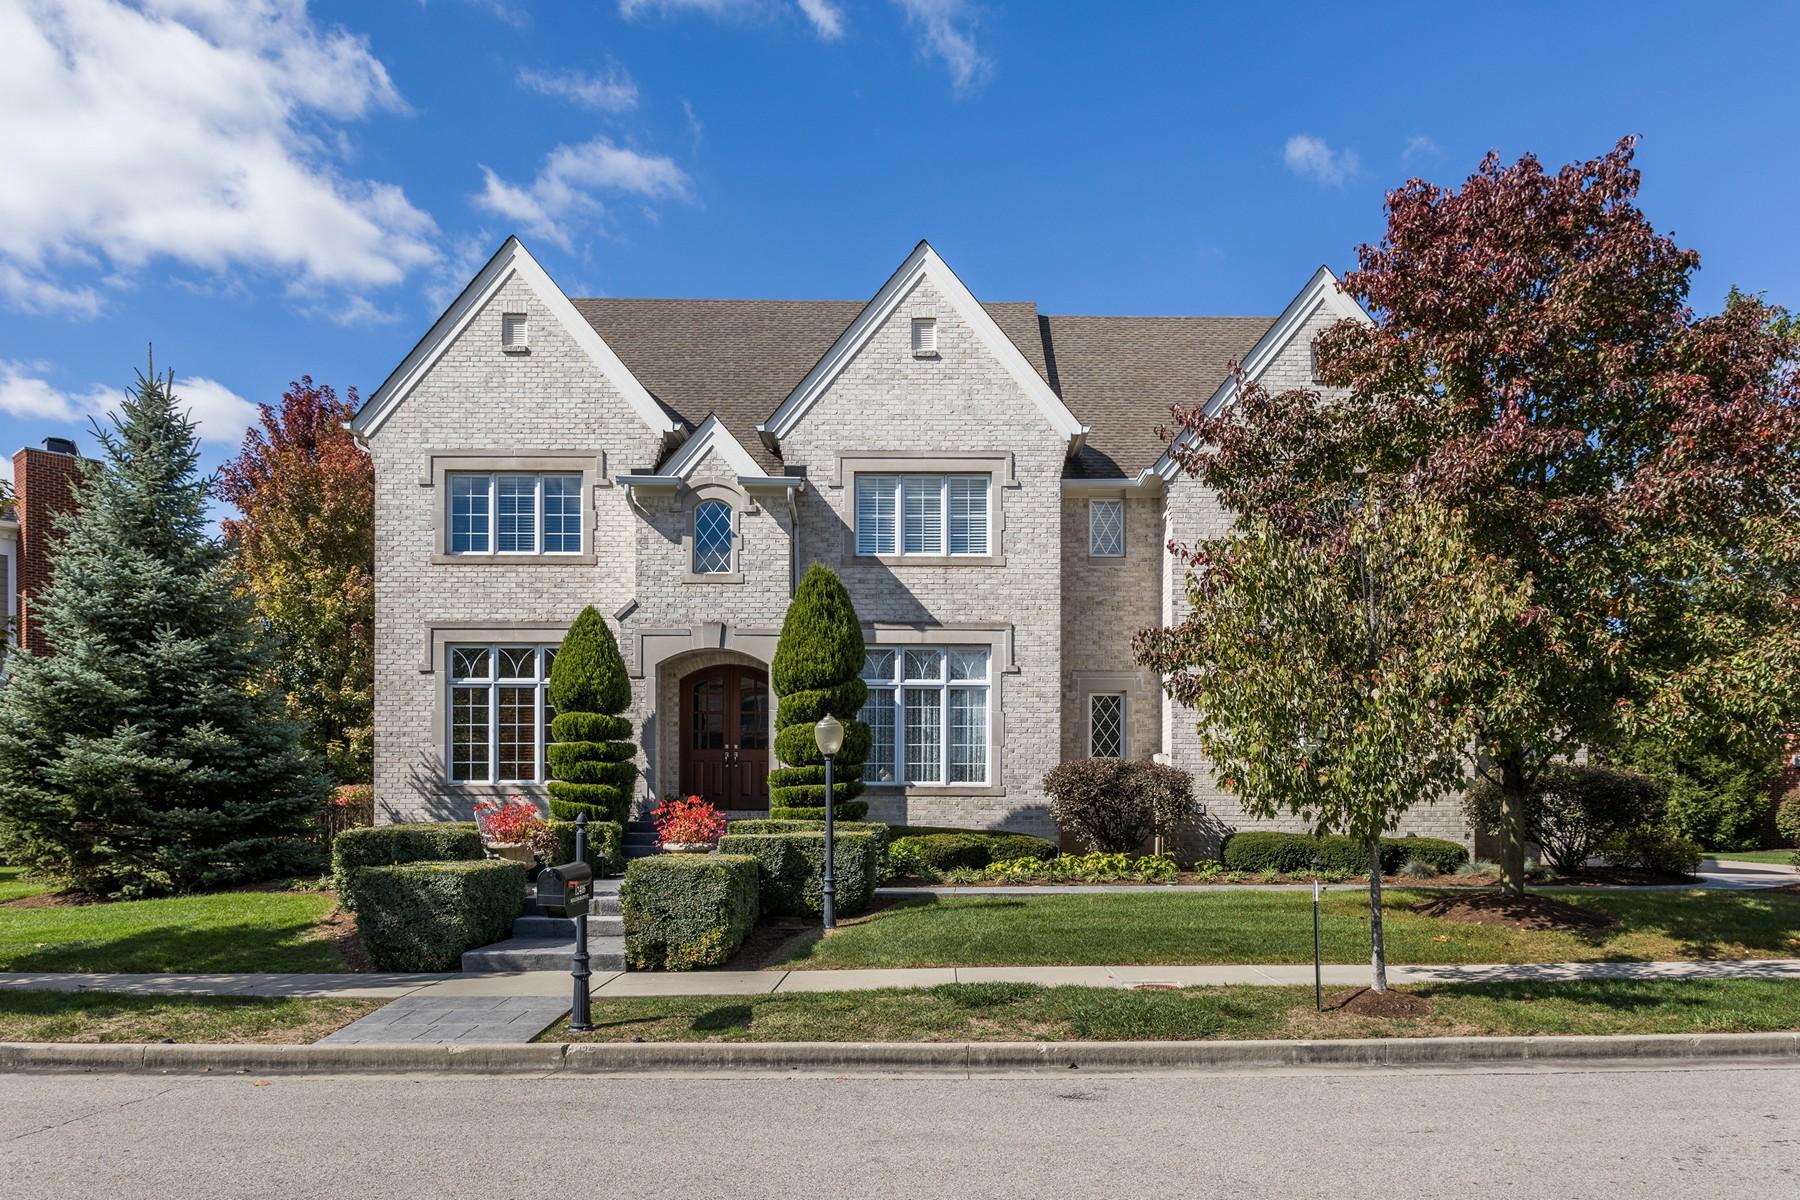 独户住宅 为 销售 在 Exquisitely Designed High End Details 12416 Bellingrath Street 卡梅尔, 印第安纳州, 46032 美国